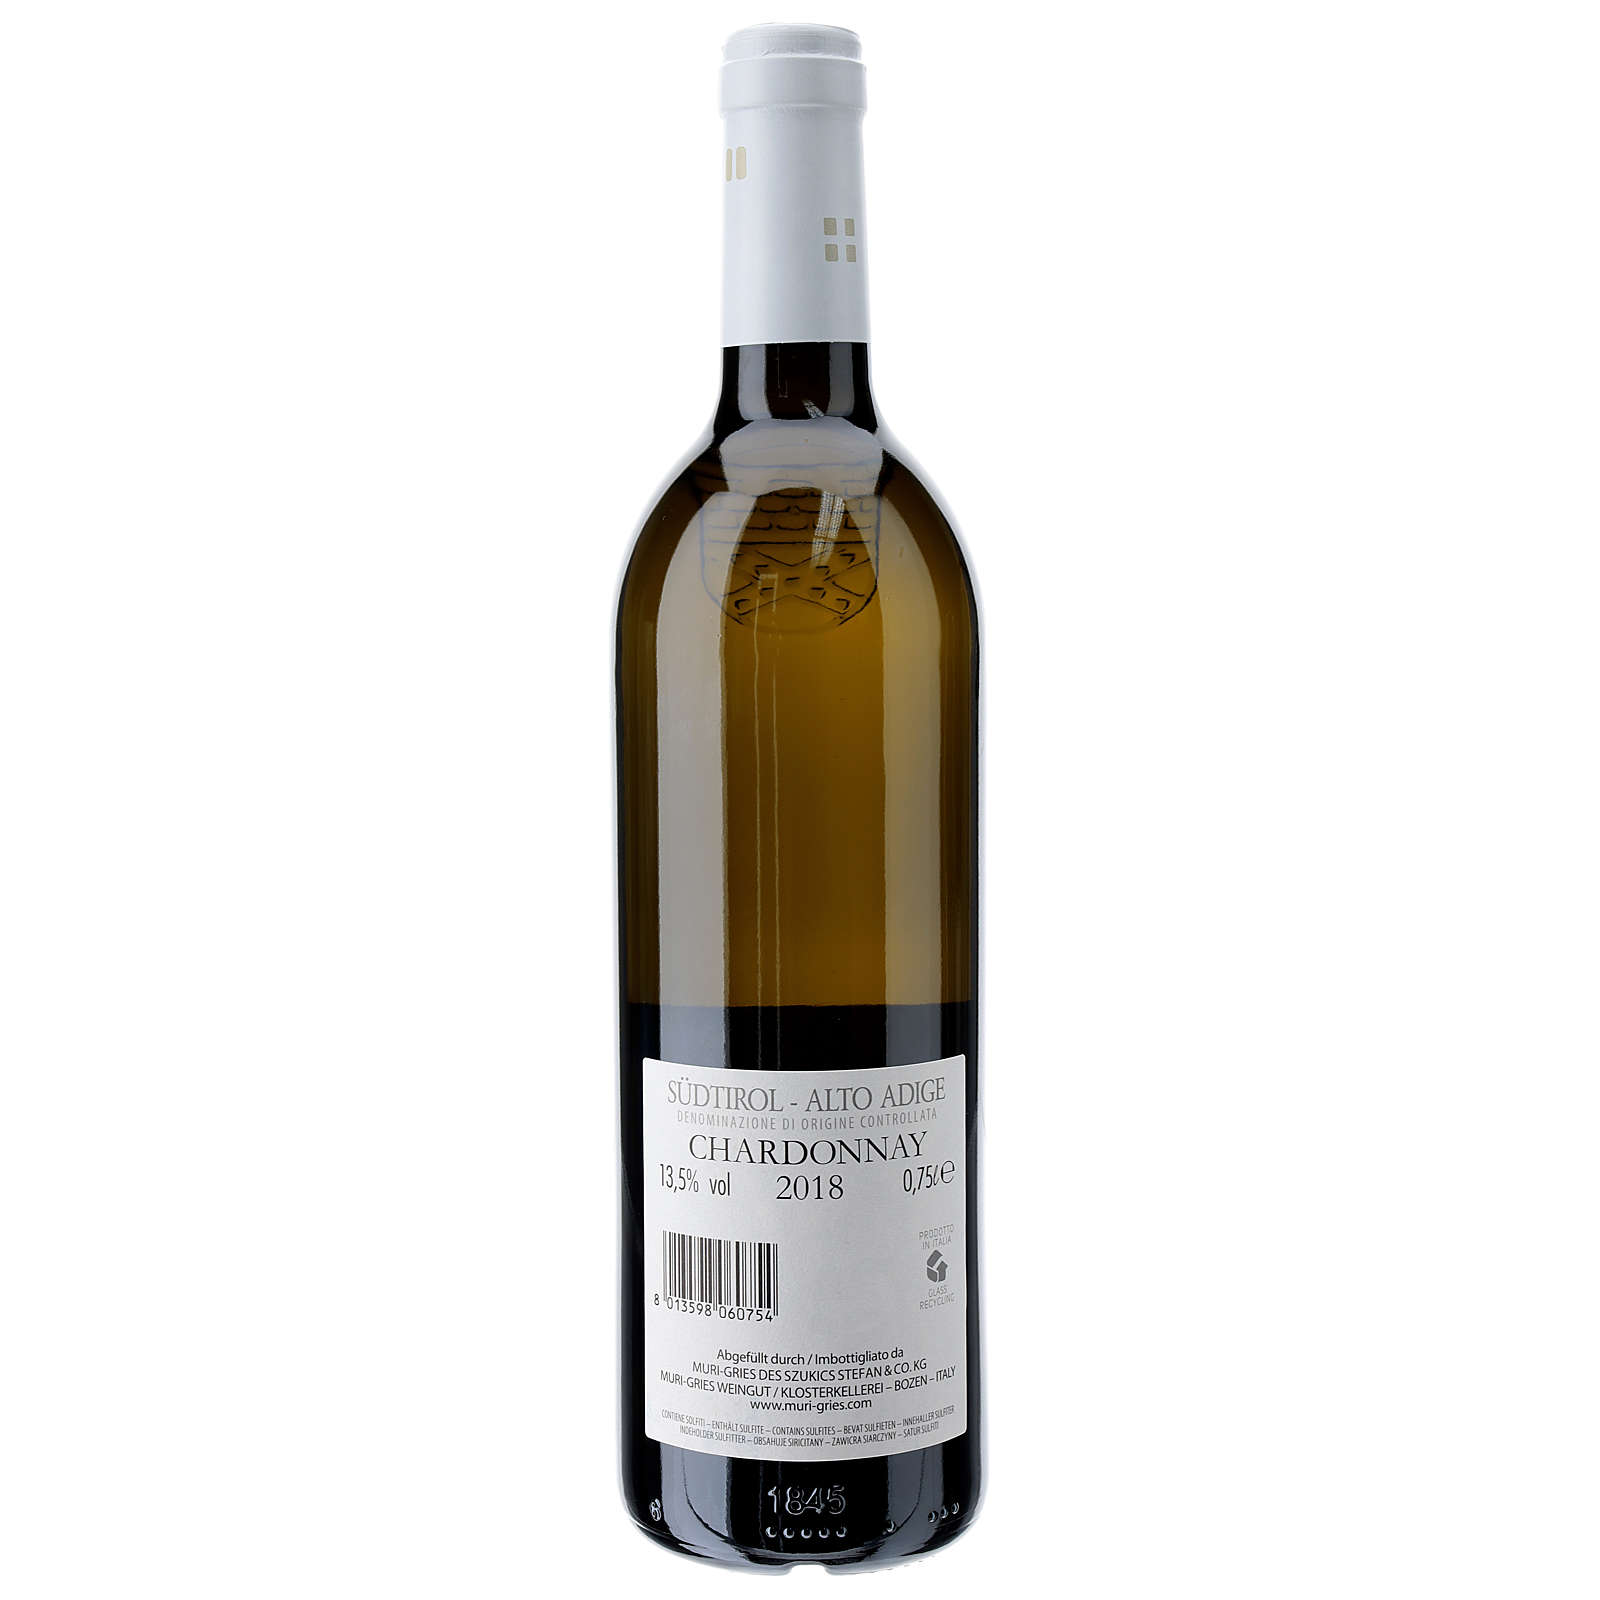 Vin Chardonnay DOC 2018 Abbaye Muri Gries 750ml 3